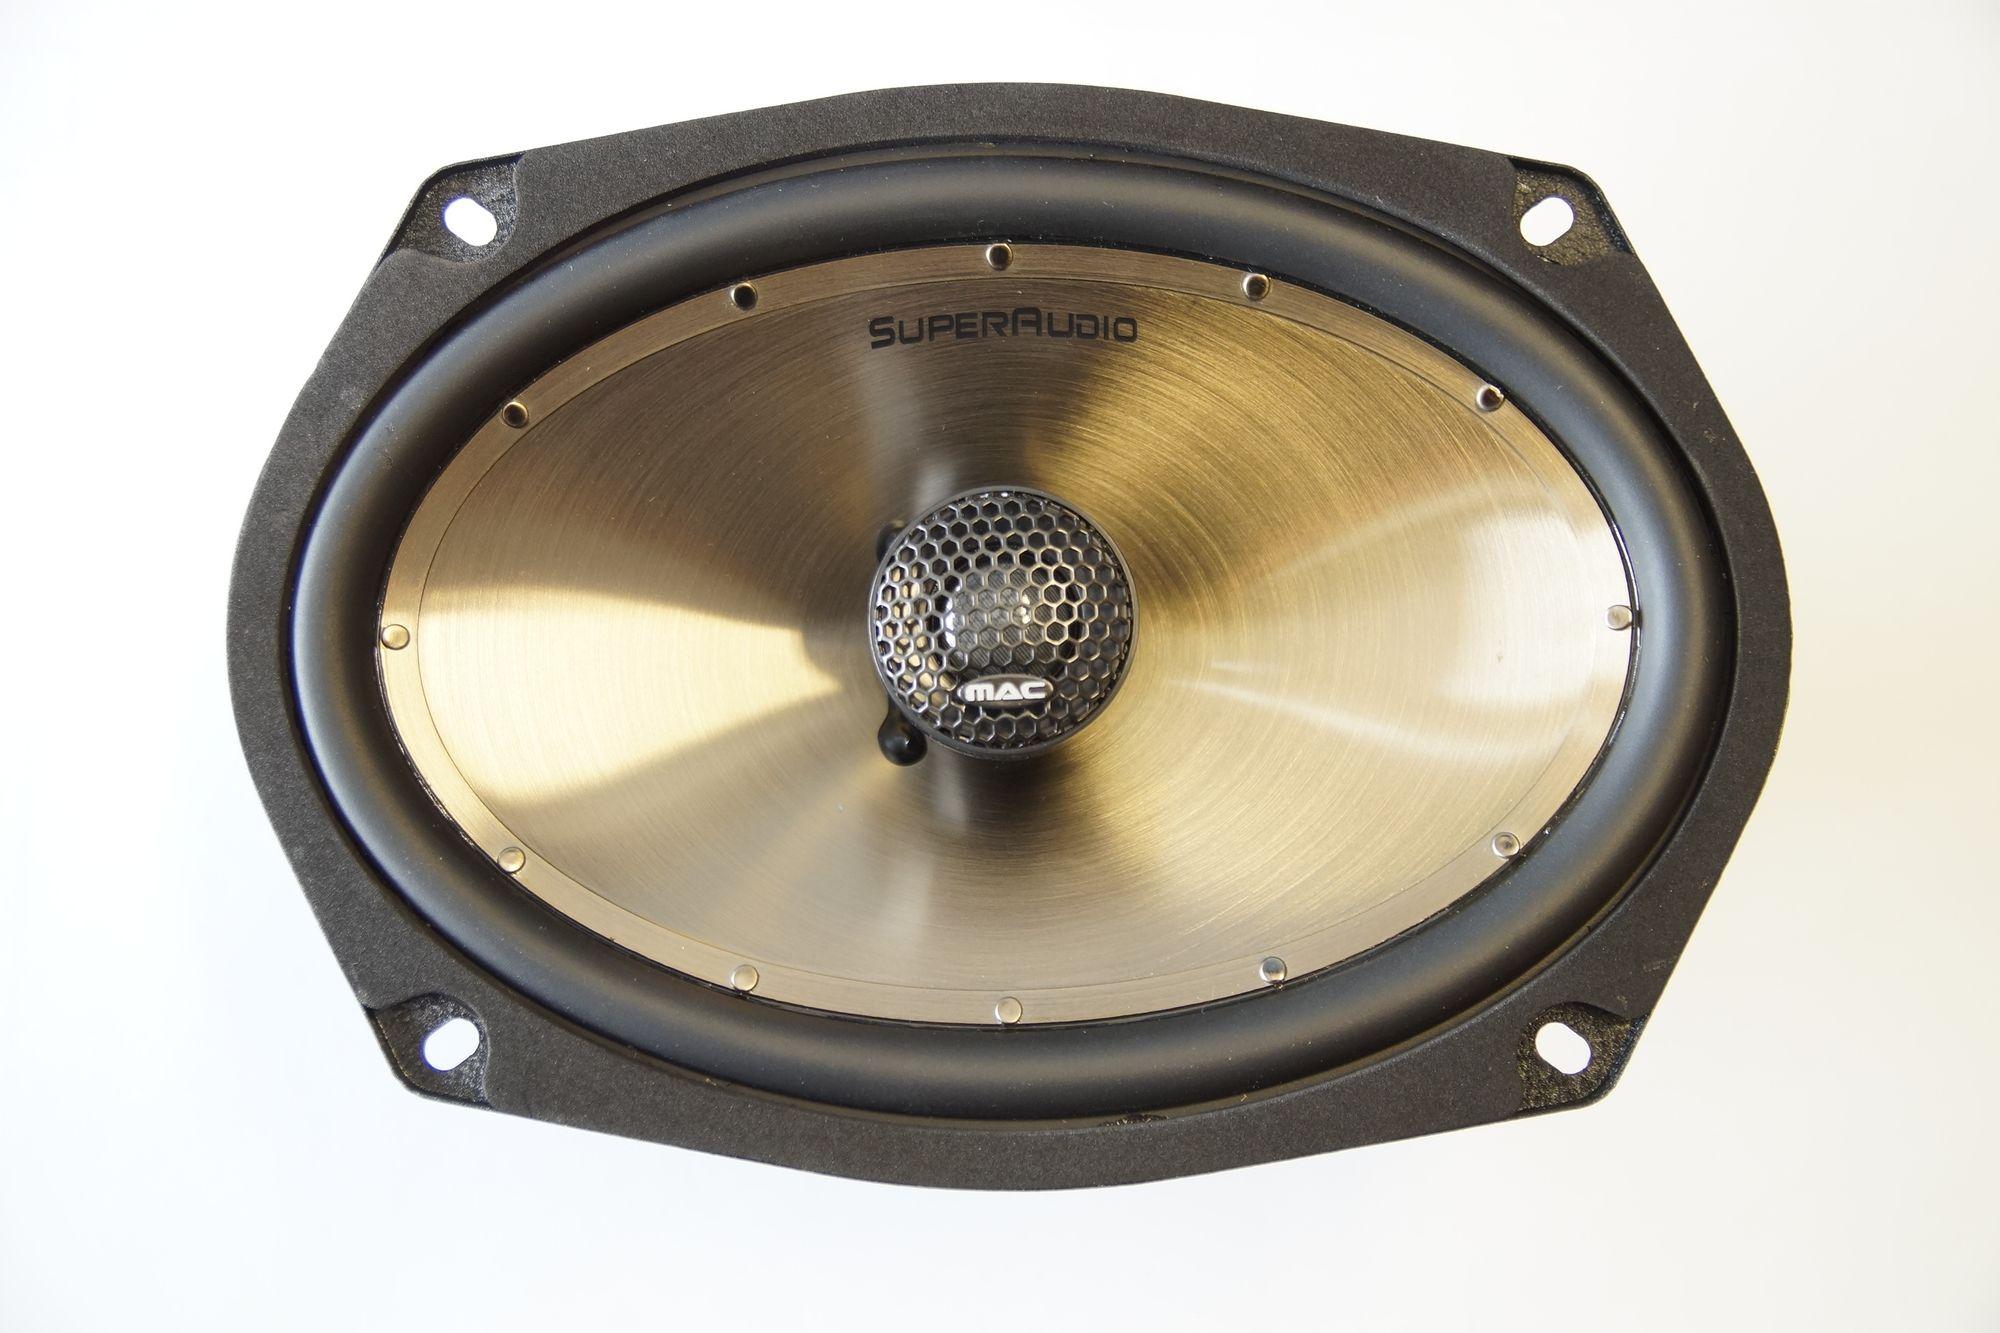 1 Paar Mac Audio Super Audio 69.2 Auto Lautsprecher 6x9 , 200 Watt max., Serviceware 001